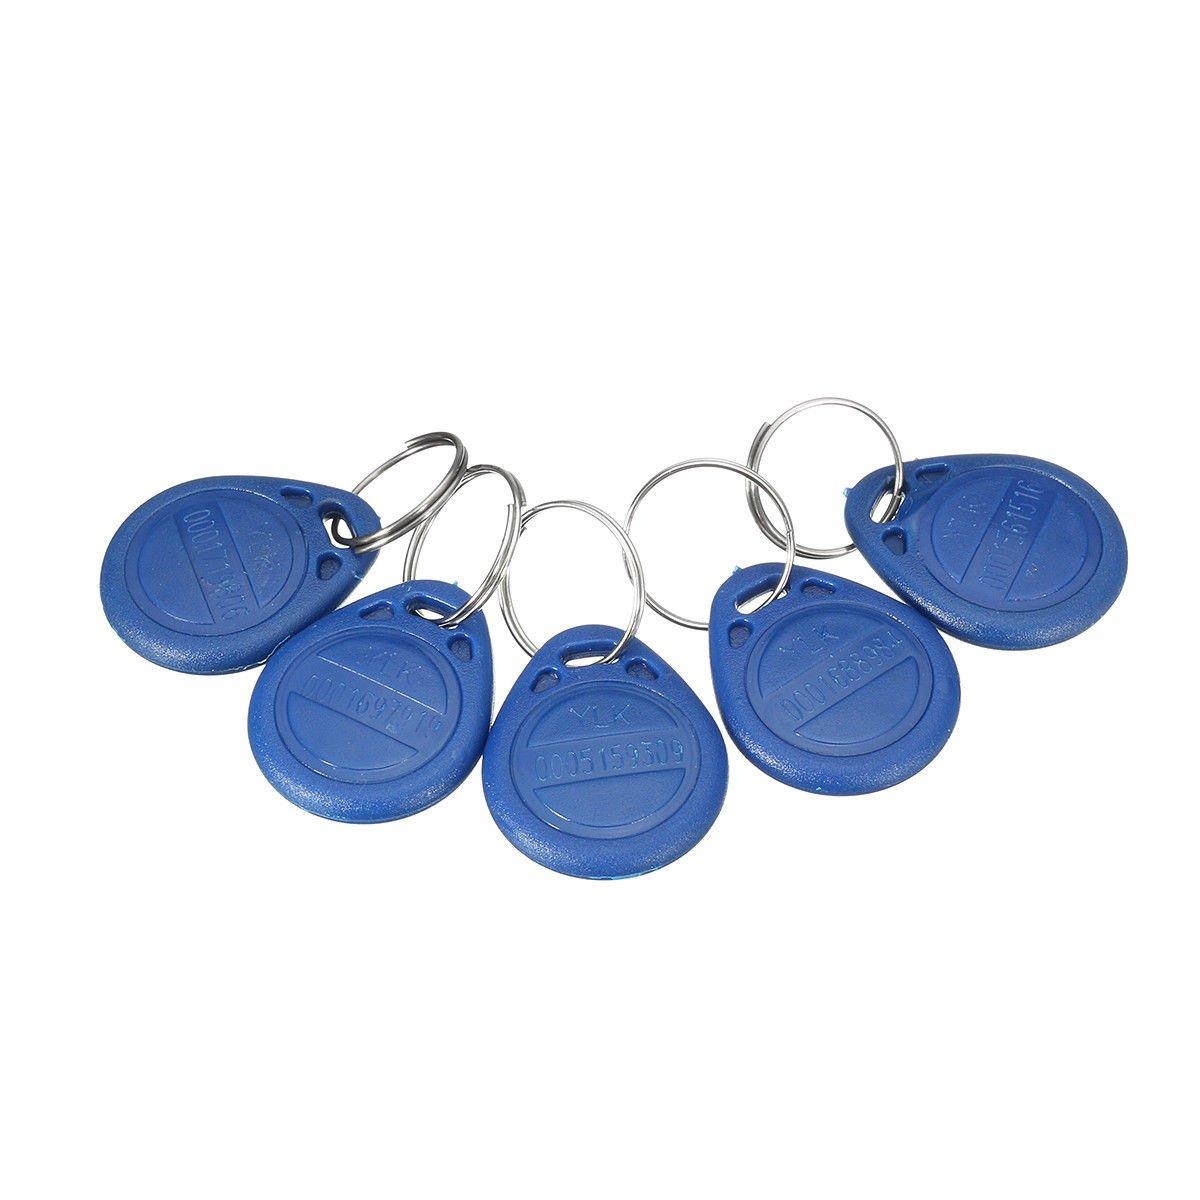 5Pcs ID Keyfbobs RFID Tag Key Ring Card 125KHZ Proximity Token Access Control